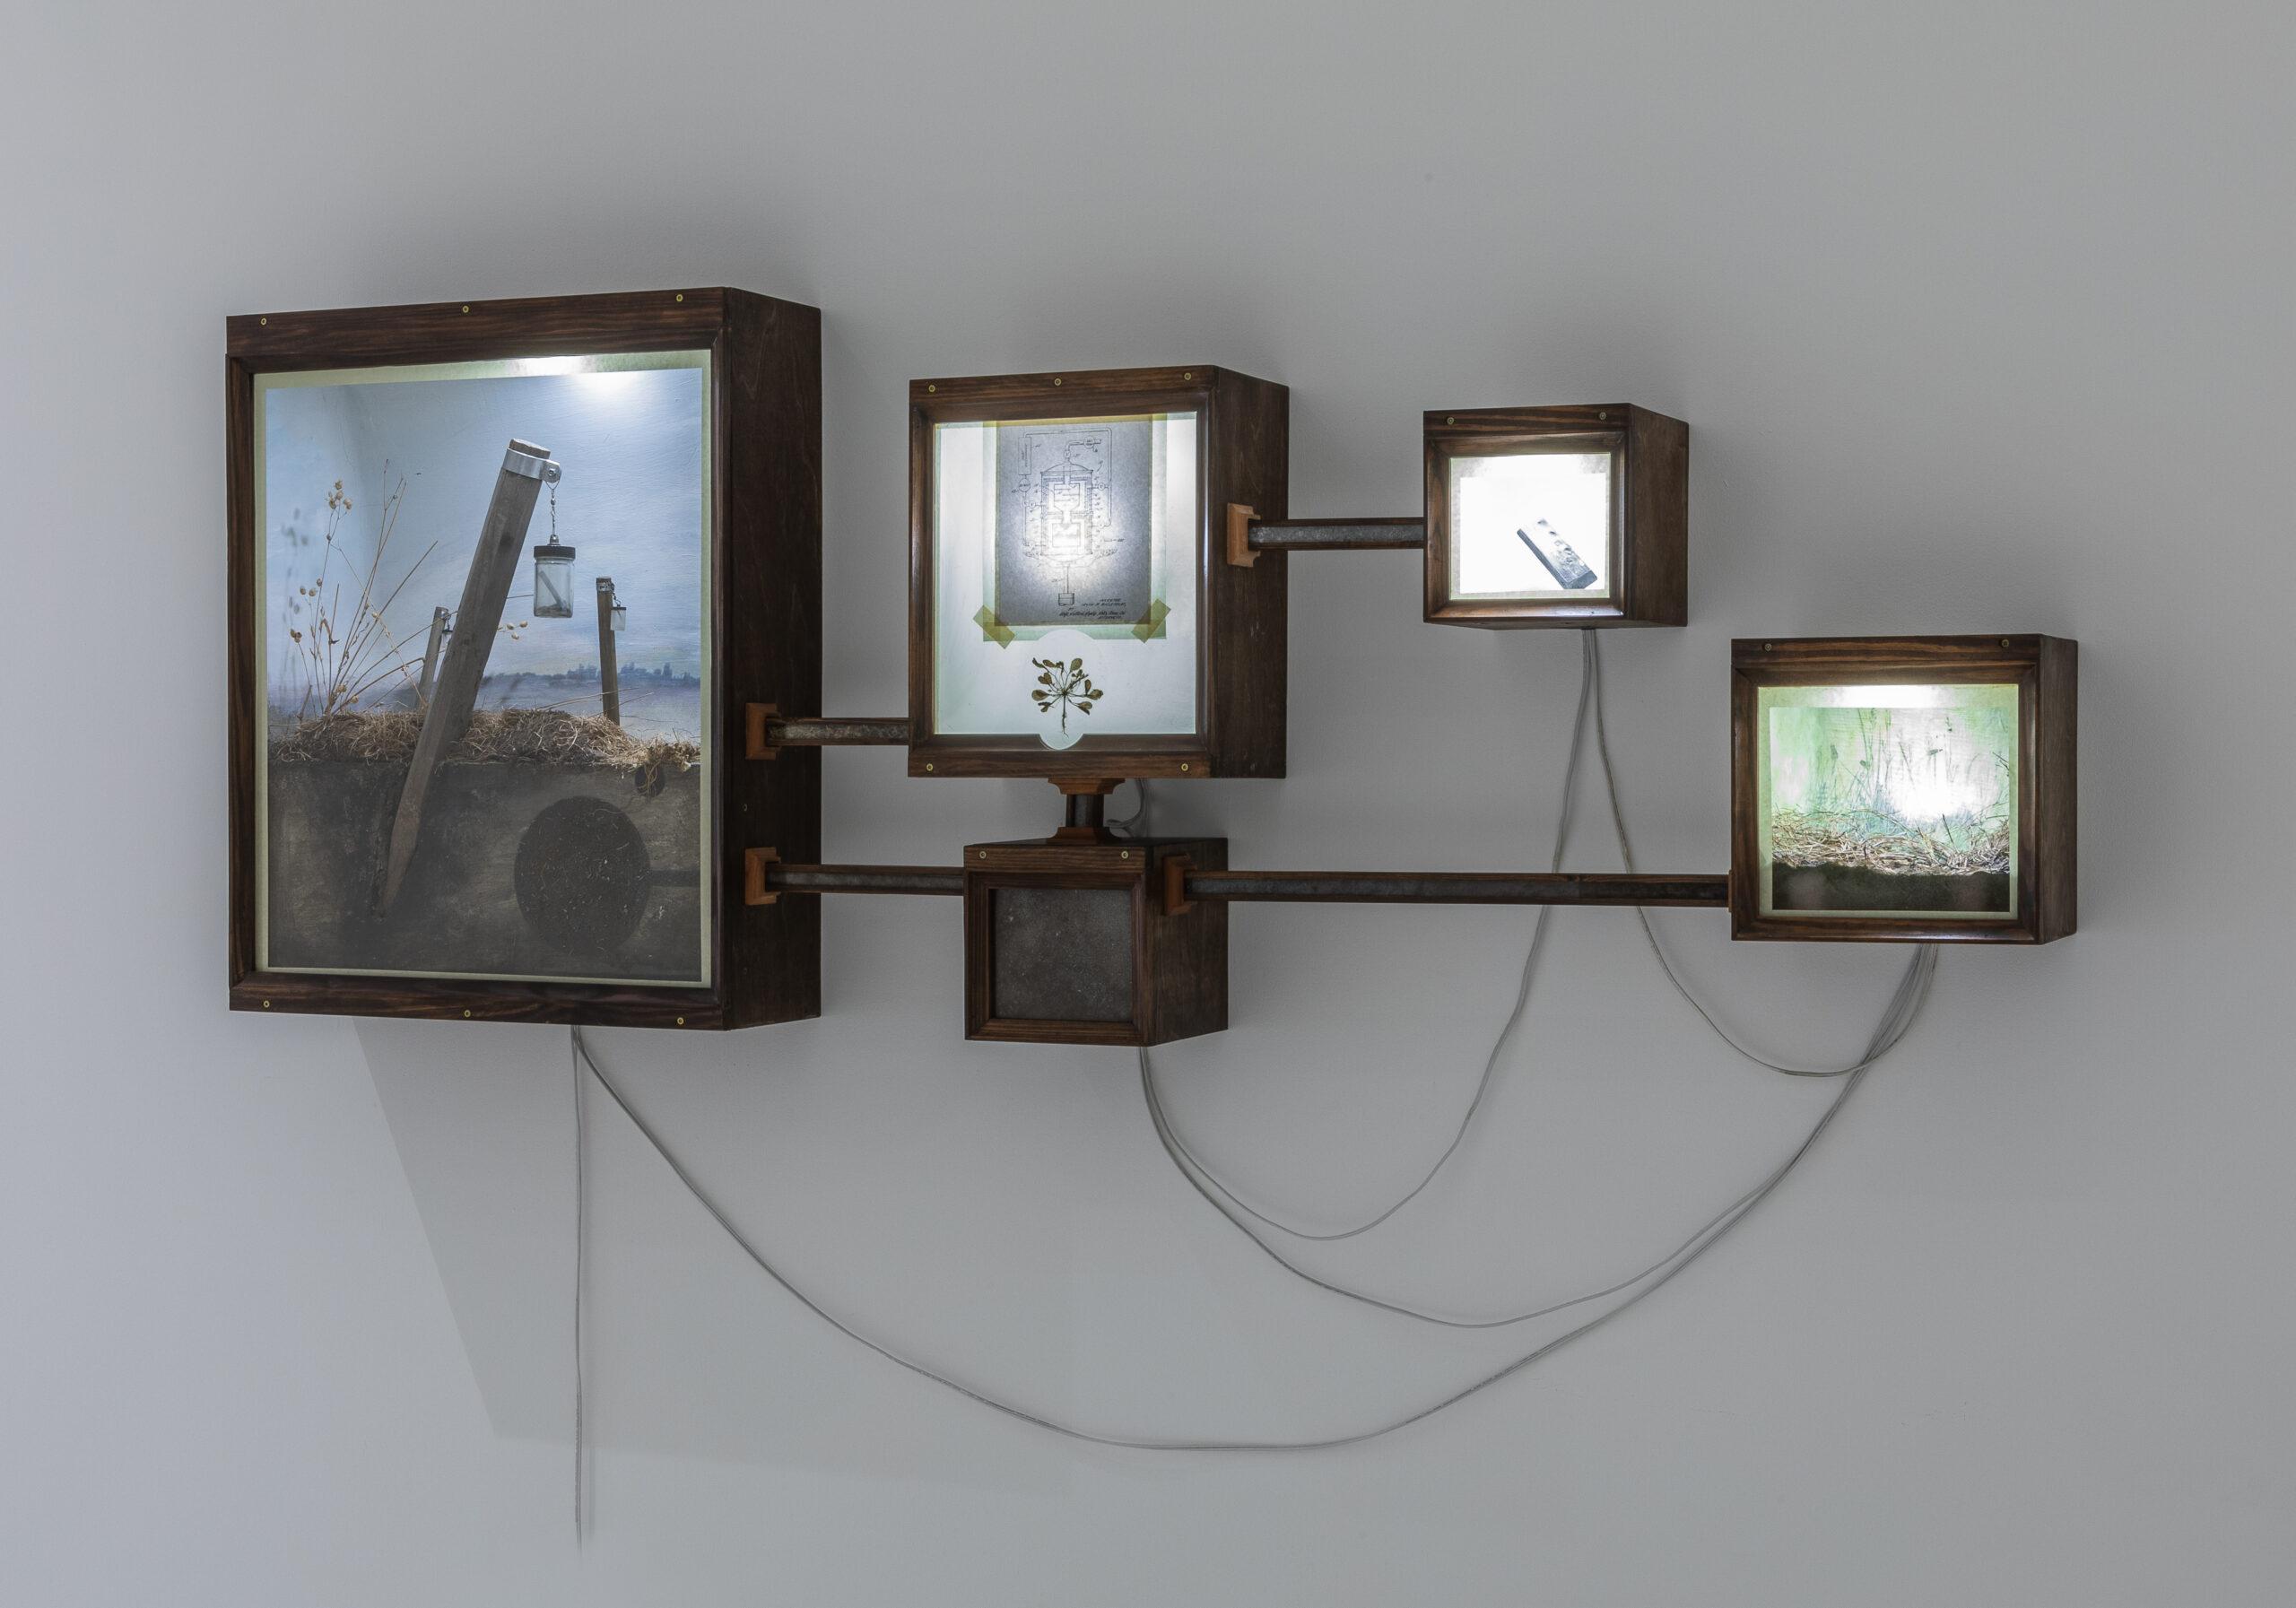 Gallery installation featuring an artwork diorama.